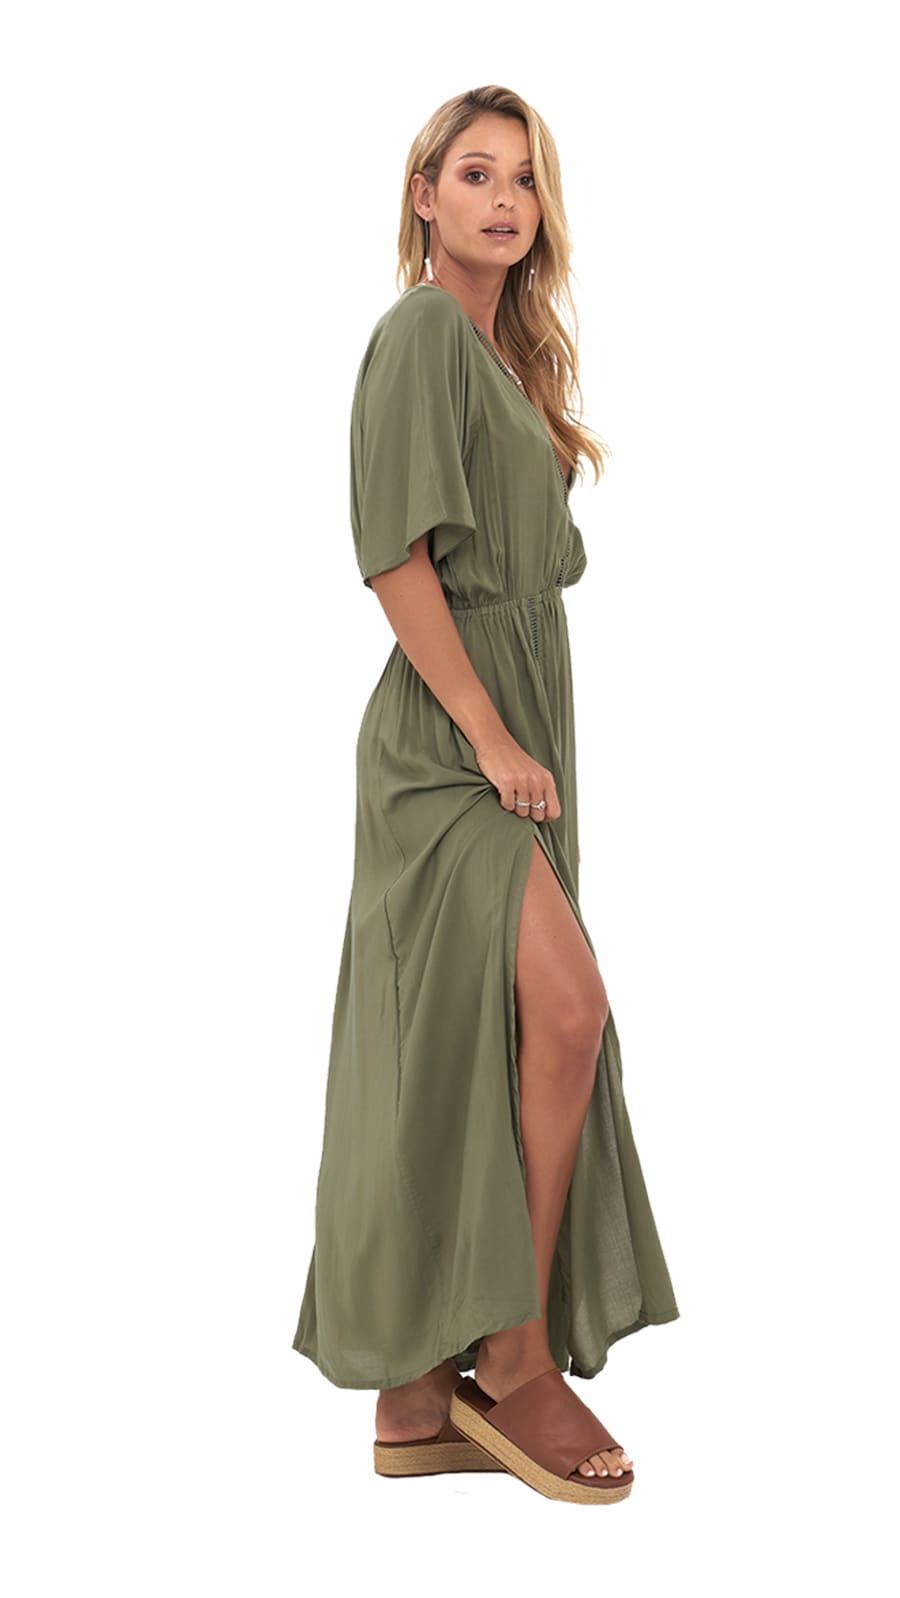 Moara Dress - Army - Back